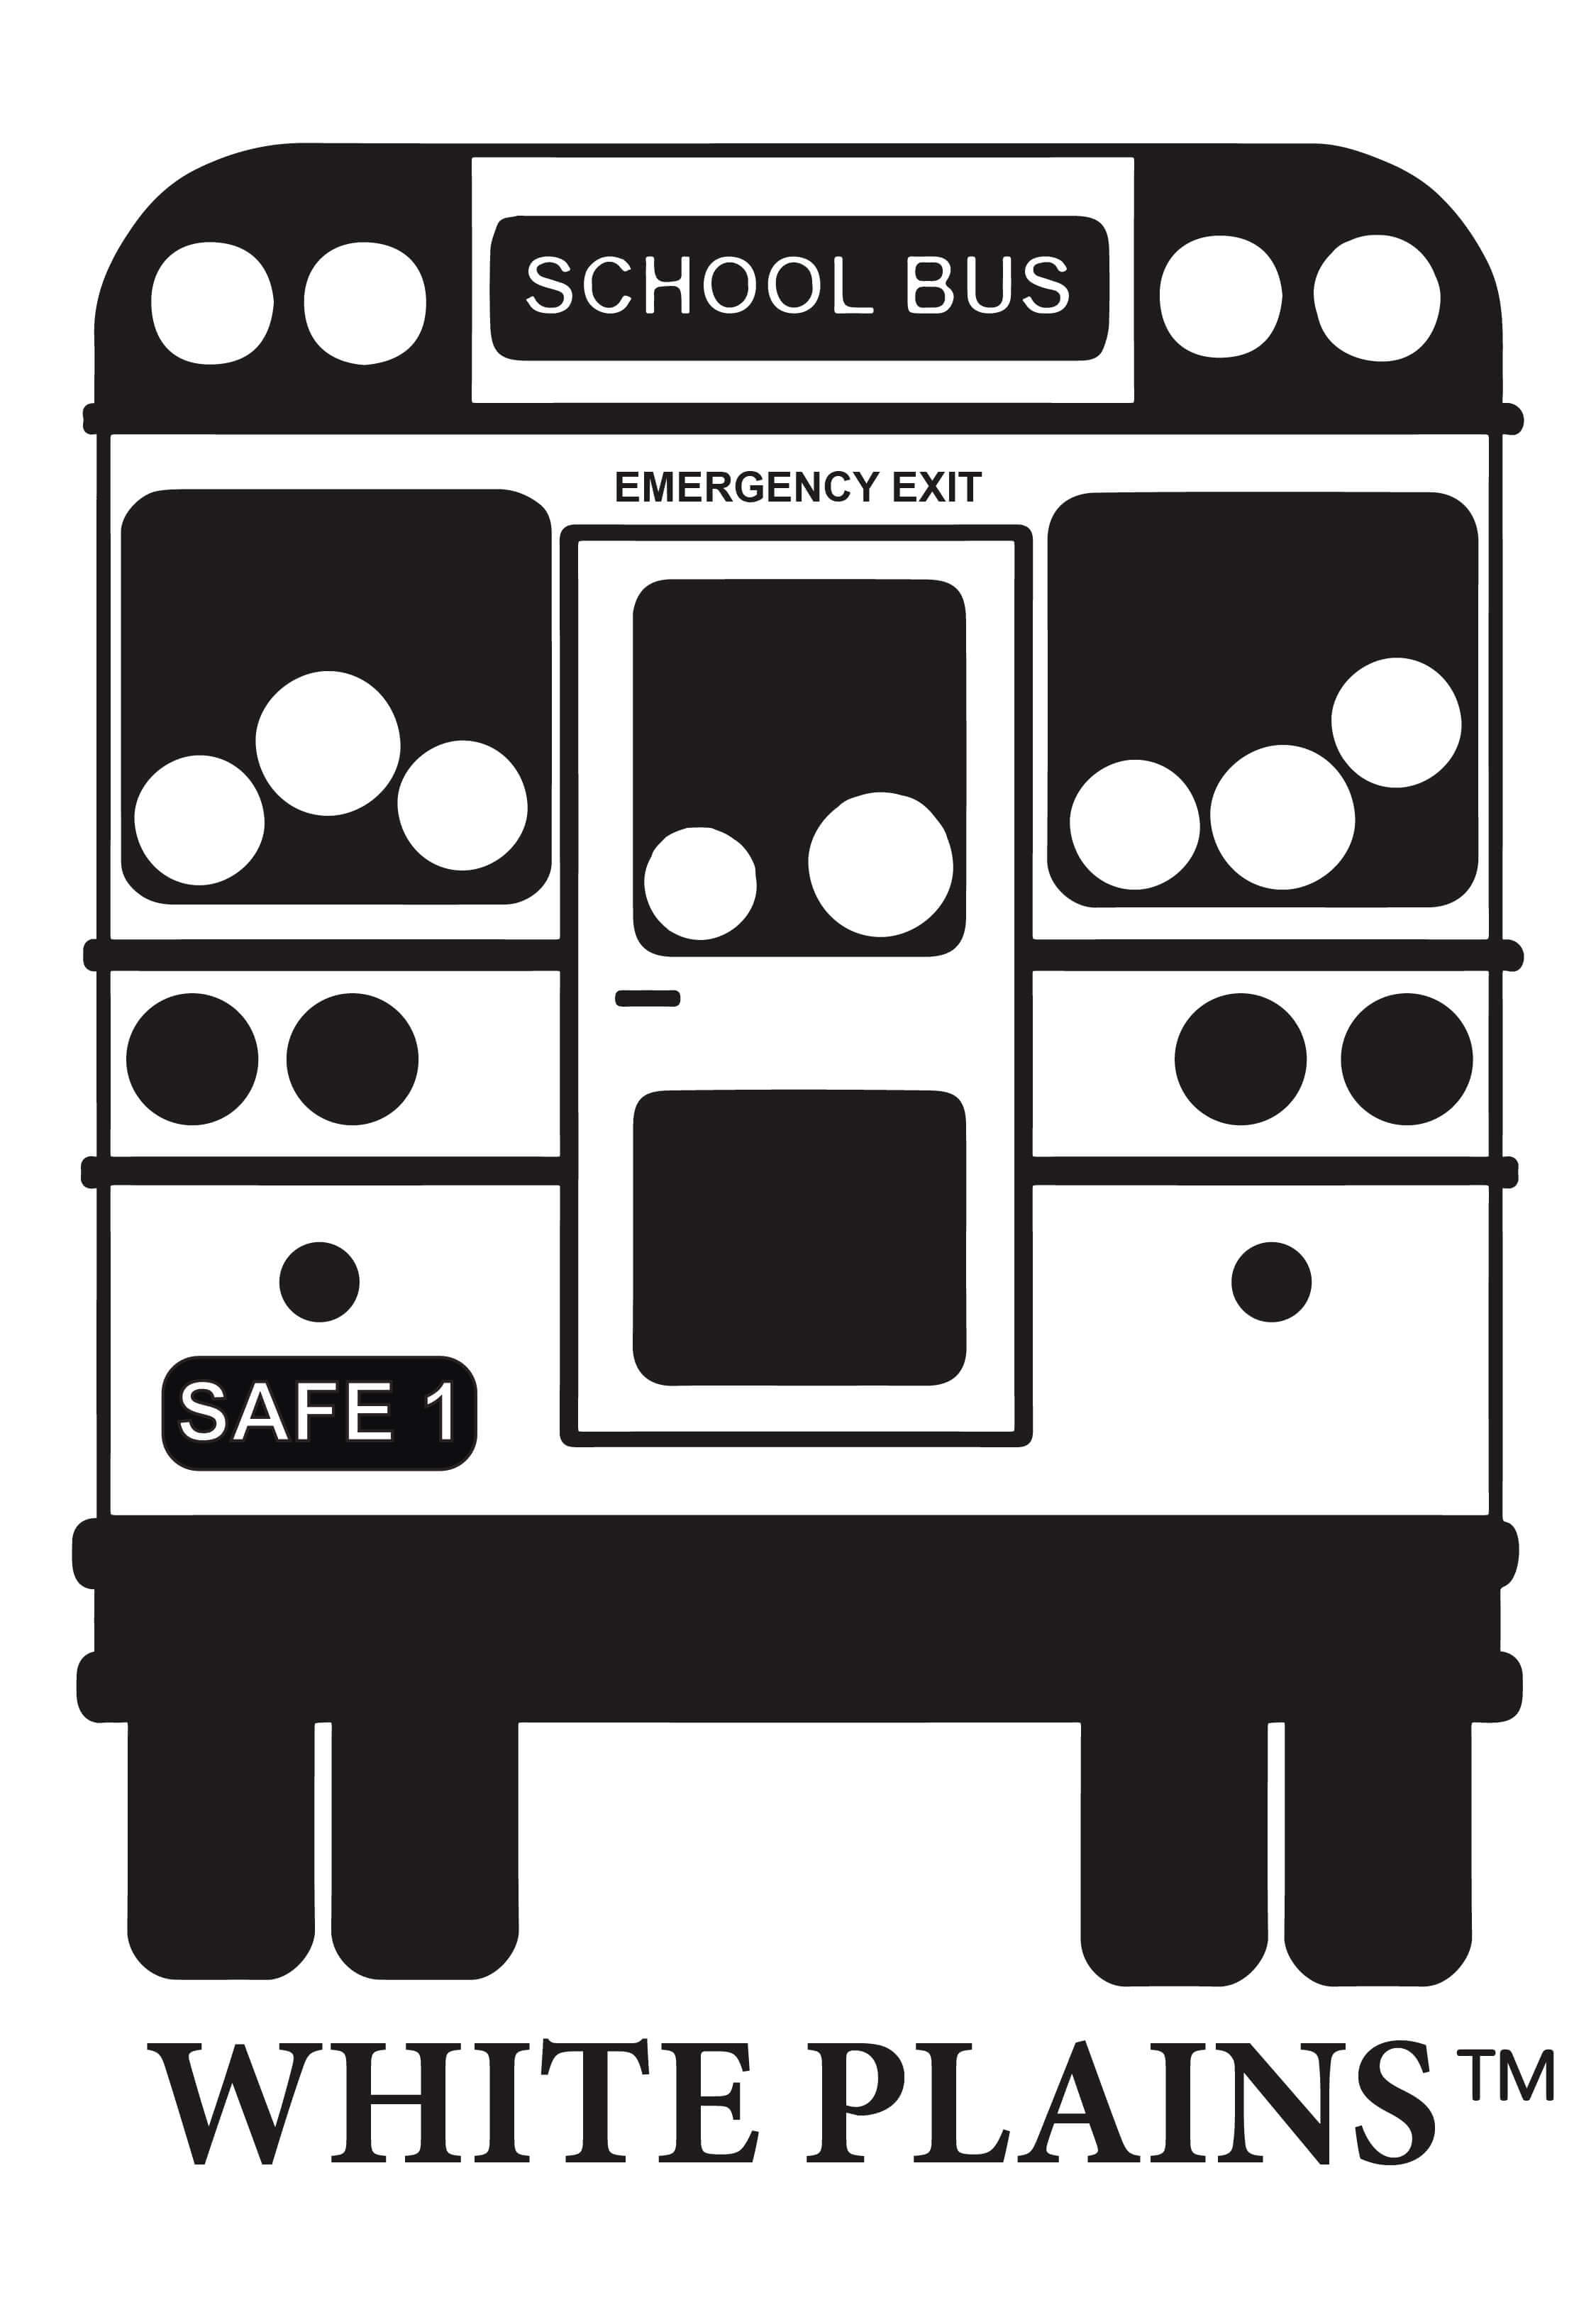 White Plains Bus Transportation